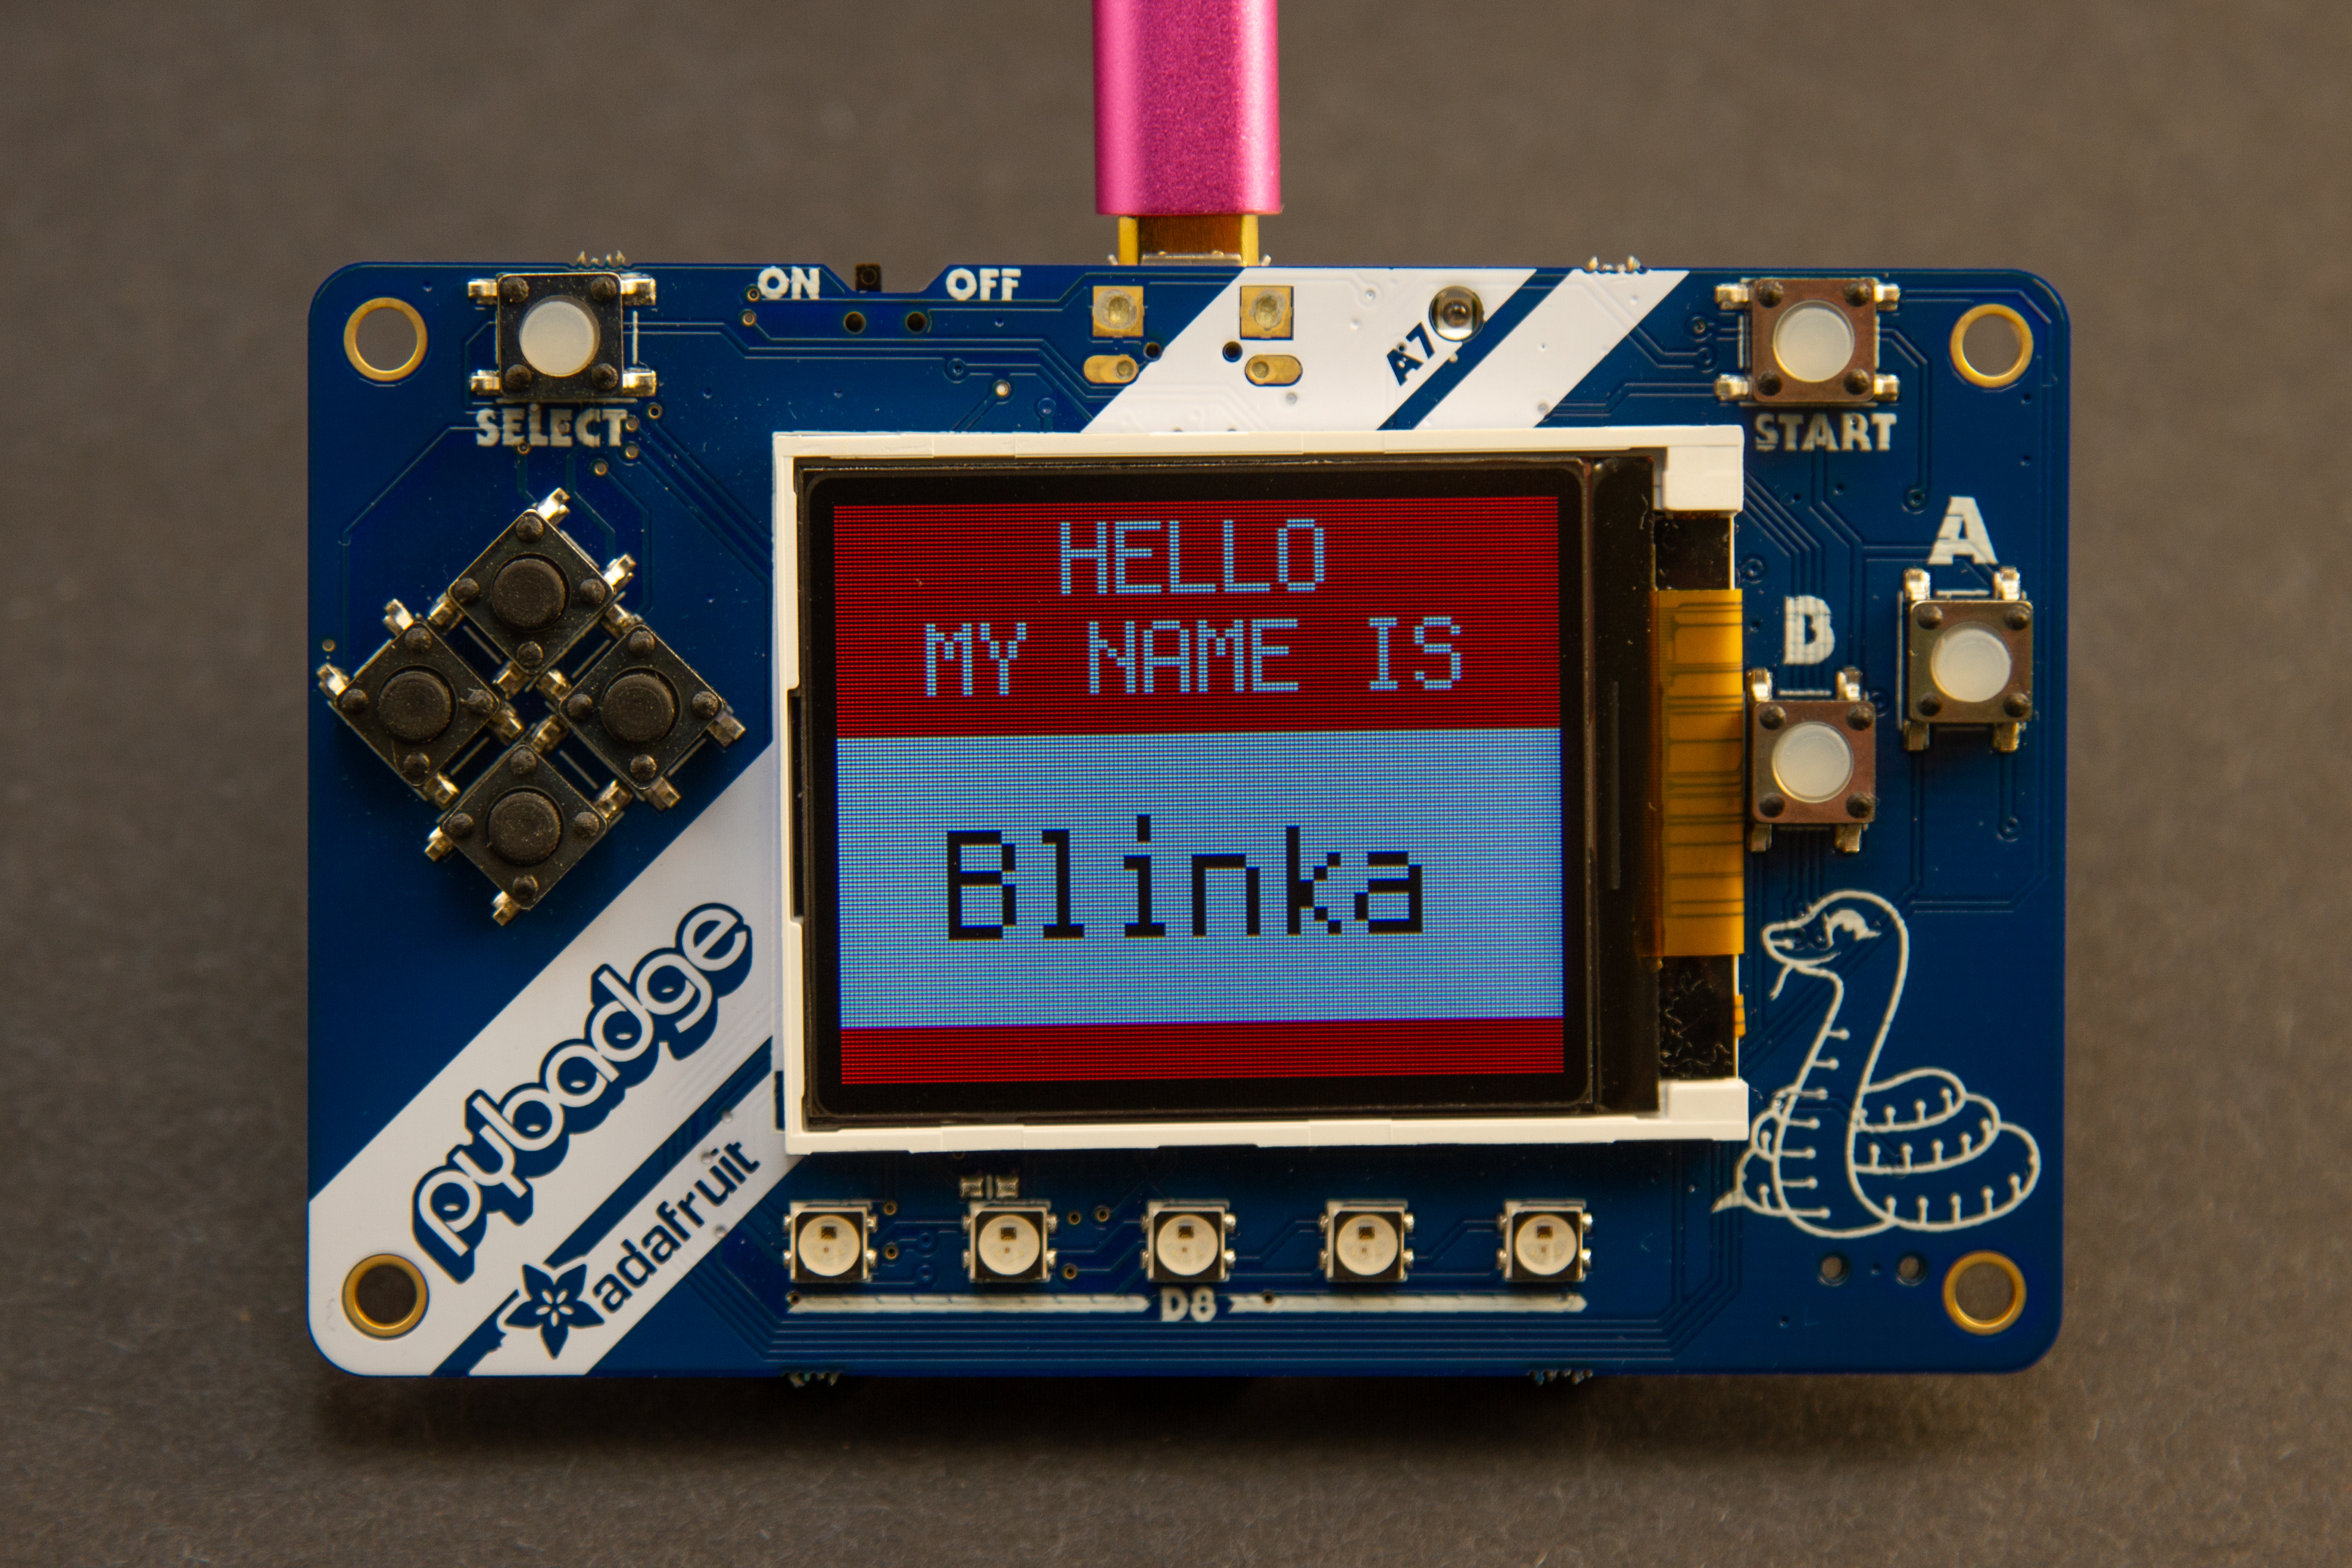 circuitpython_PyBadger_Dimmed_Screen.jpg